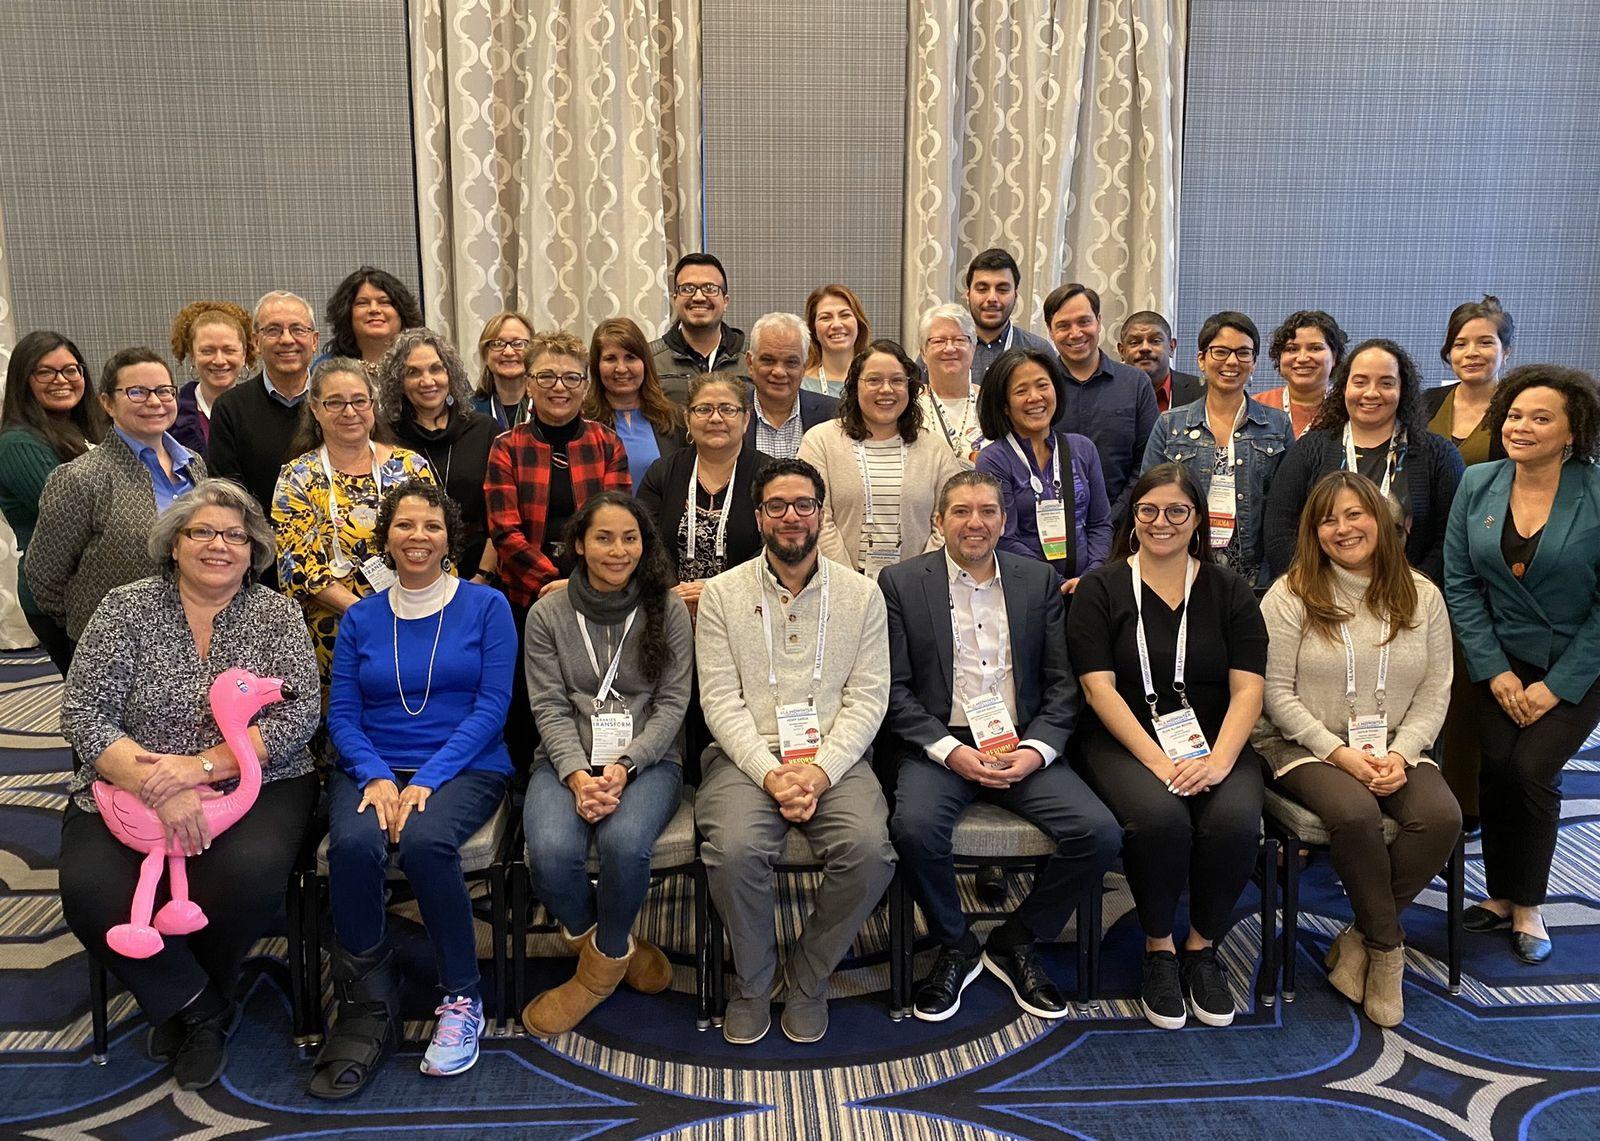 group photo after general membership meeting at ala midwinter 2020